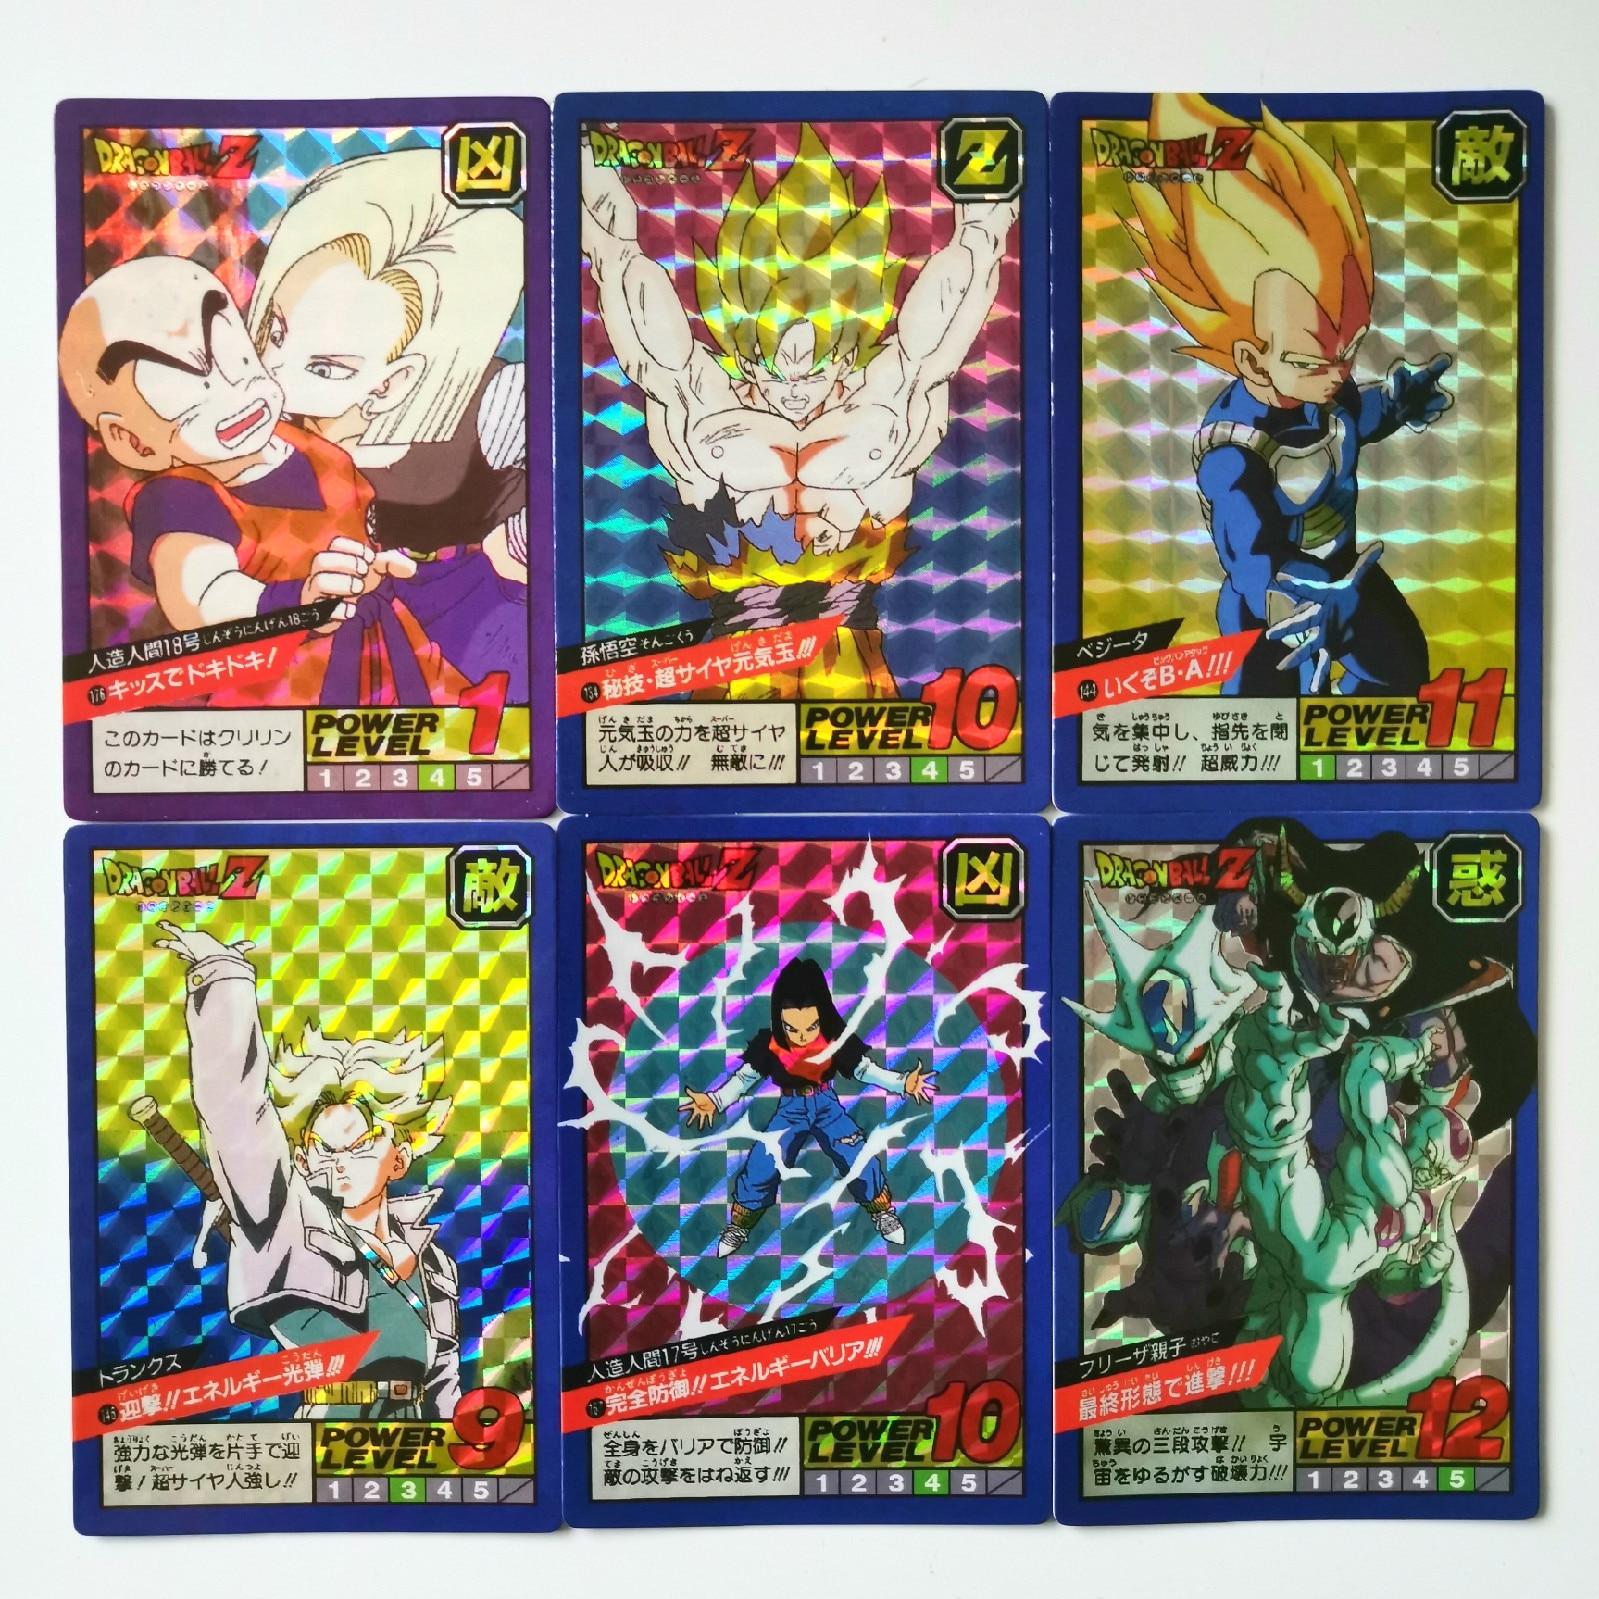 42pcs/set Super Dragon Ball Z Fighting 4 Reissue Heroes Battle Card Ultra Instinct Goku Vegeta Game Collection Cards